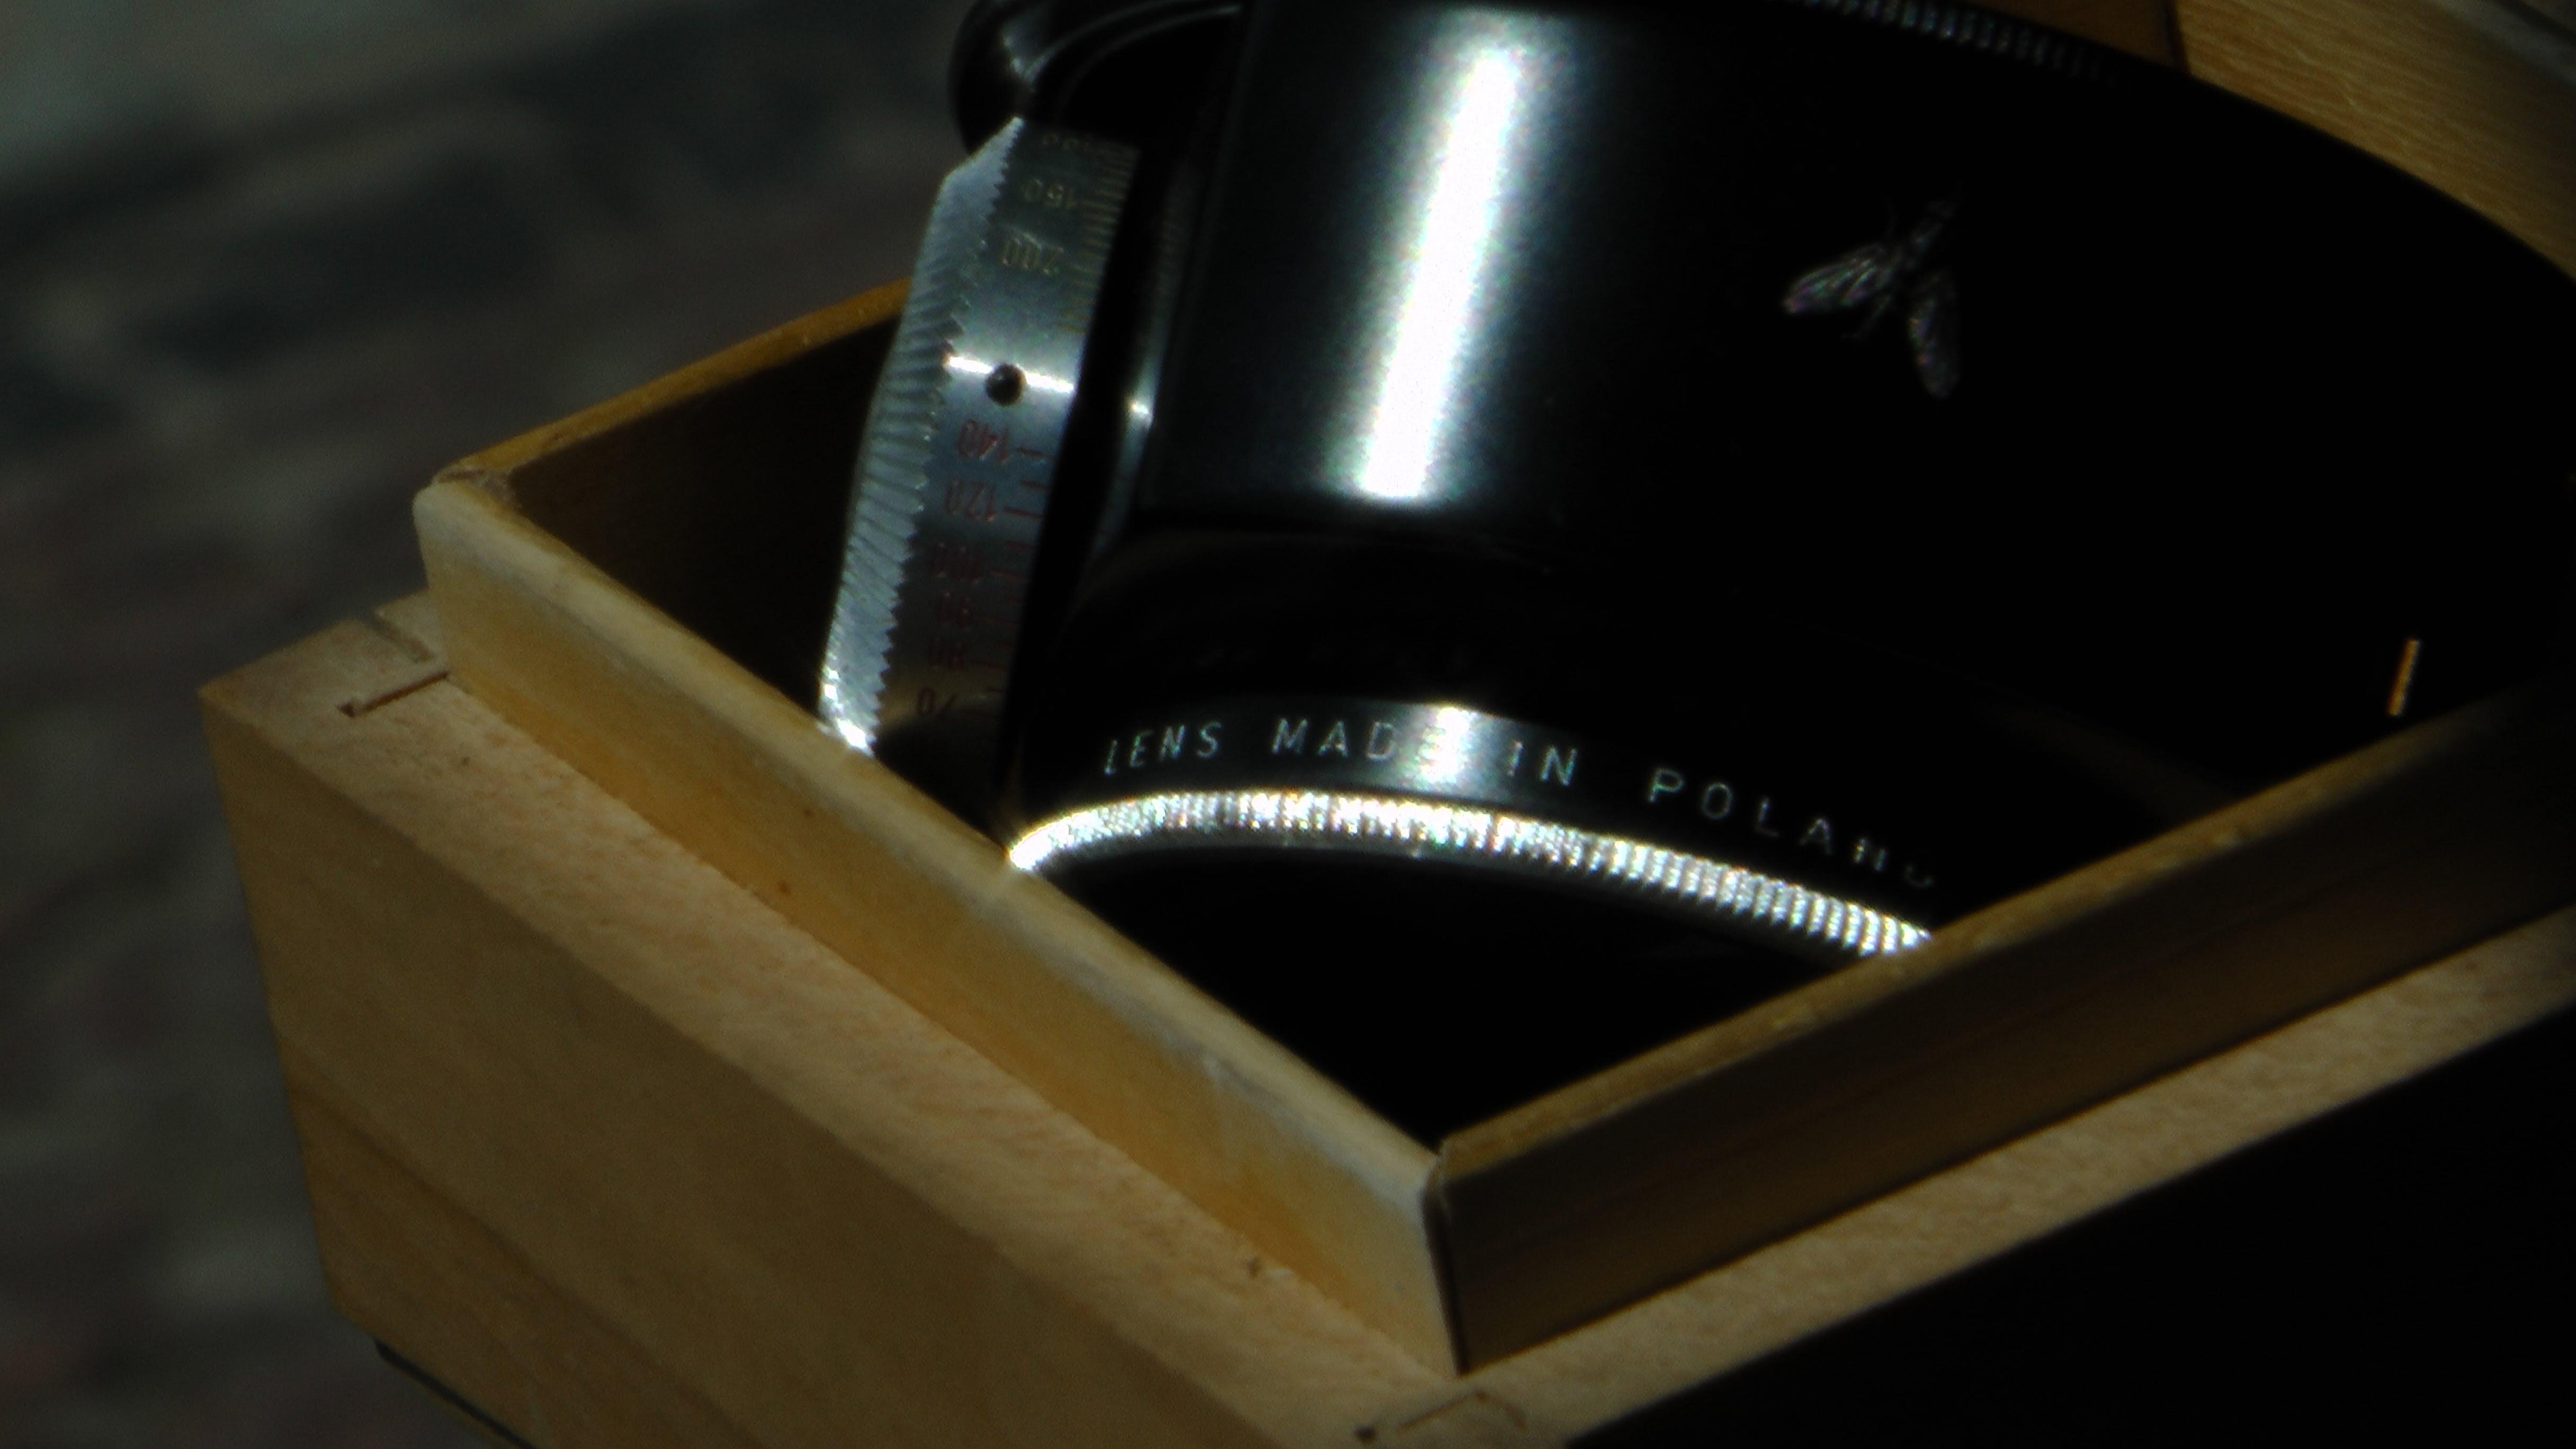 Free stock photo of dutch angle, JANPOL, janpol color, lens